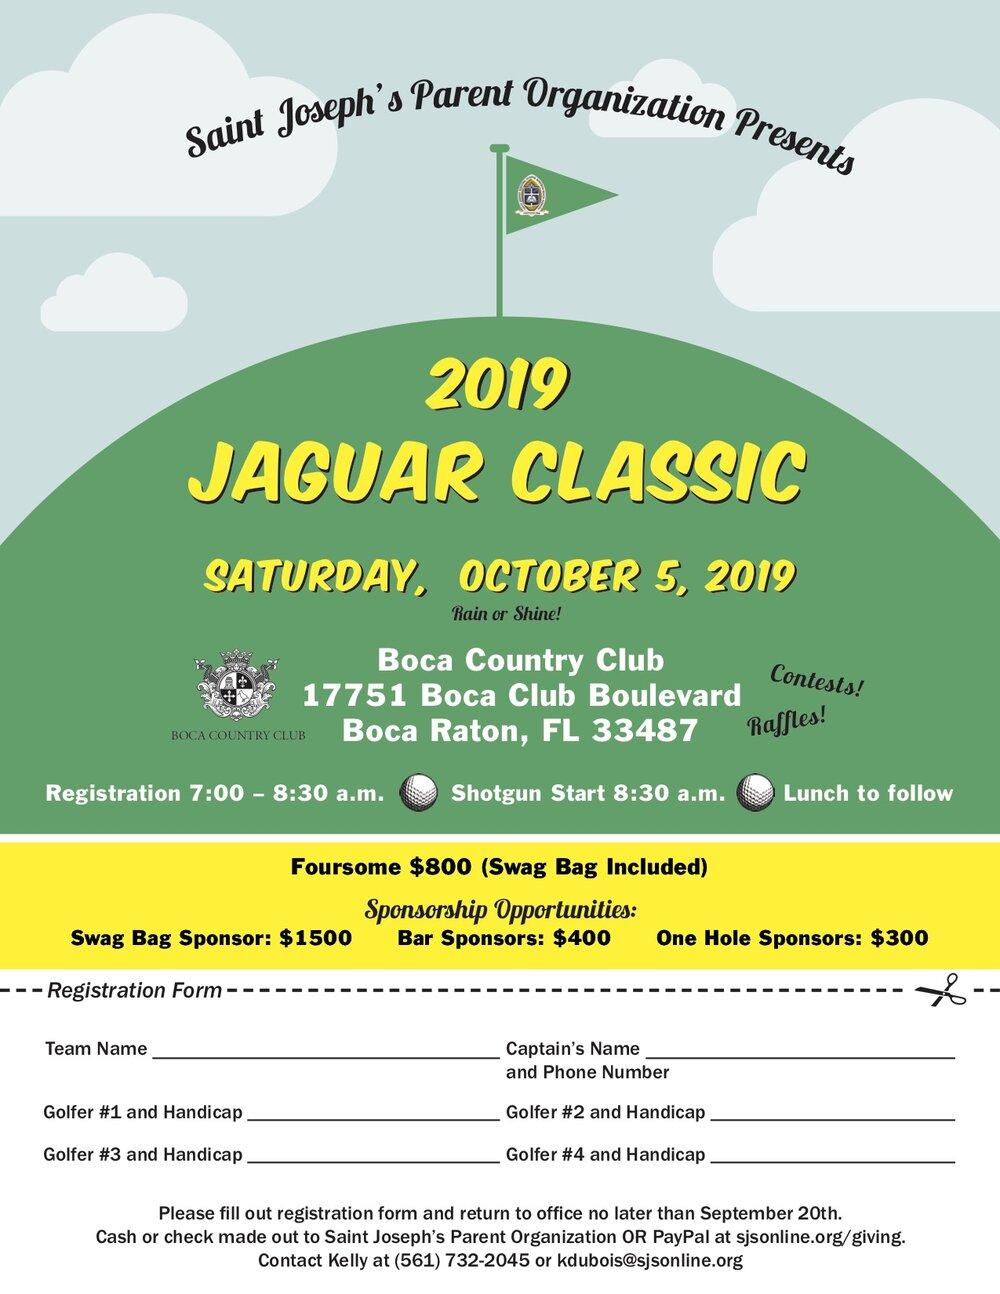 Jaguar Classic Flyer 2019.jpg